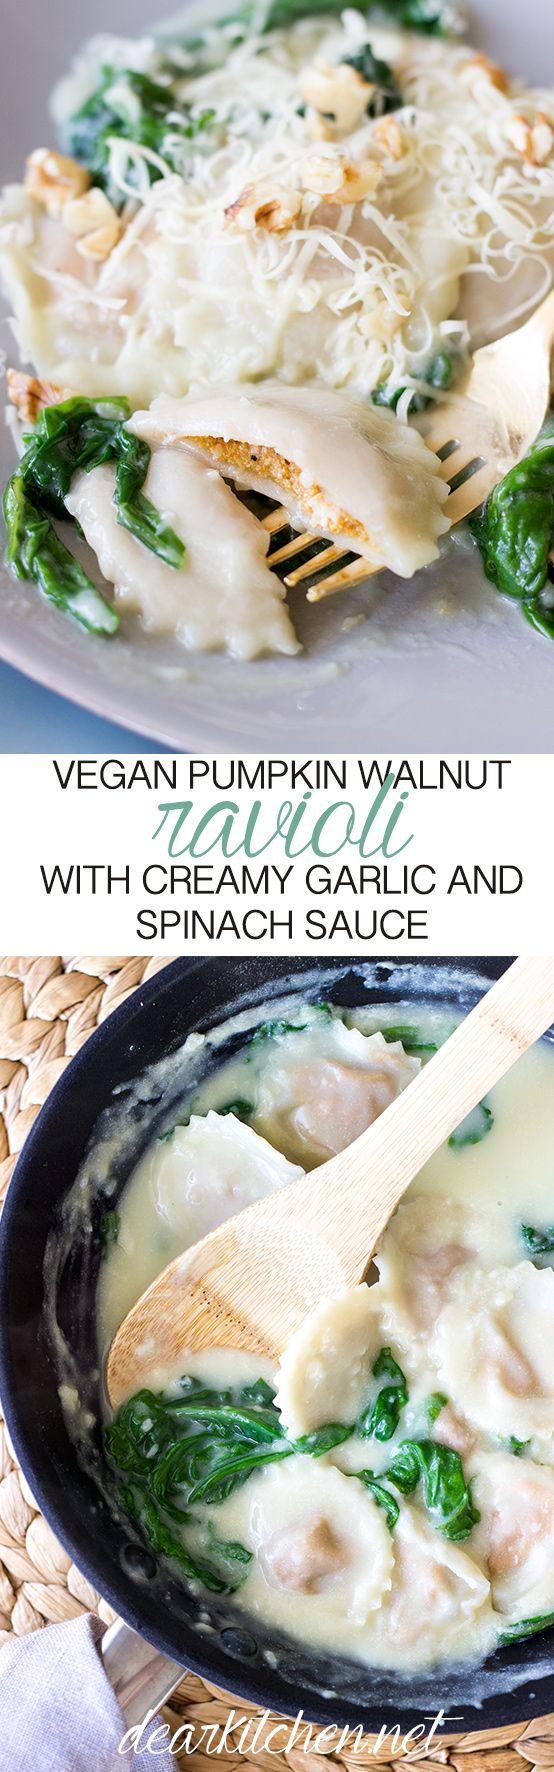 A home made Pumpkin and Walnut Ravioli in a Creamy Garlic Sauce with Spinach…